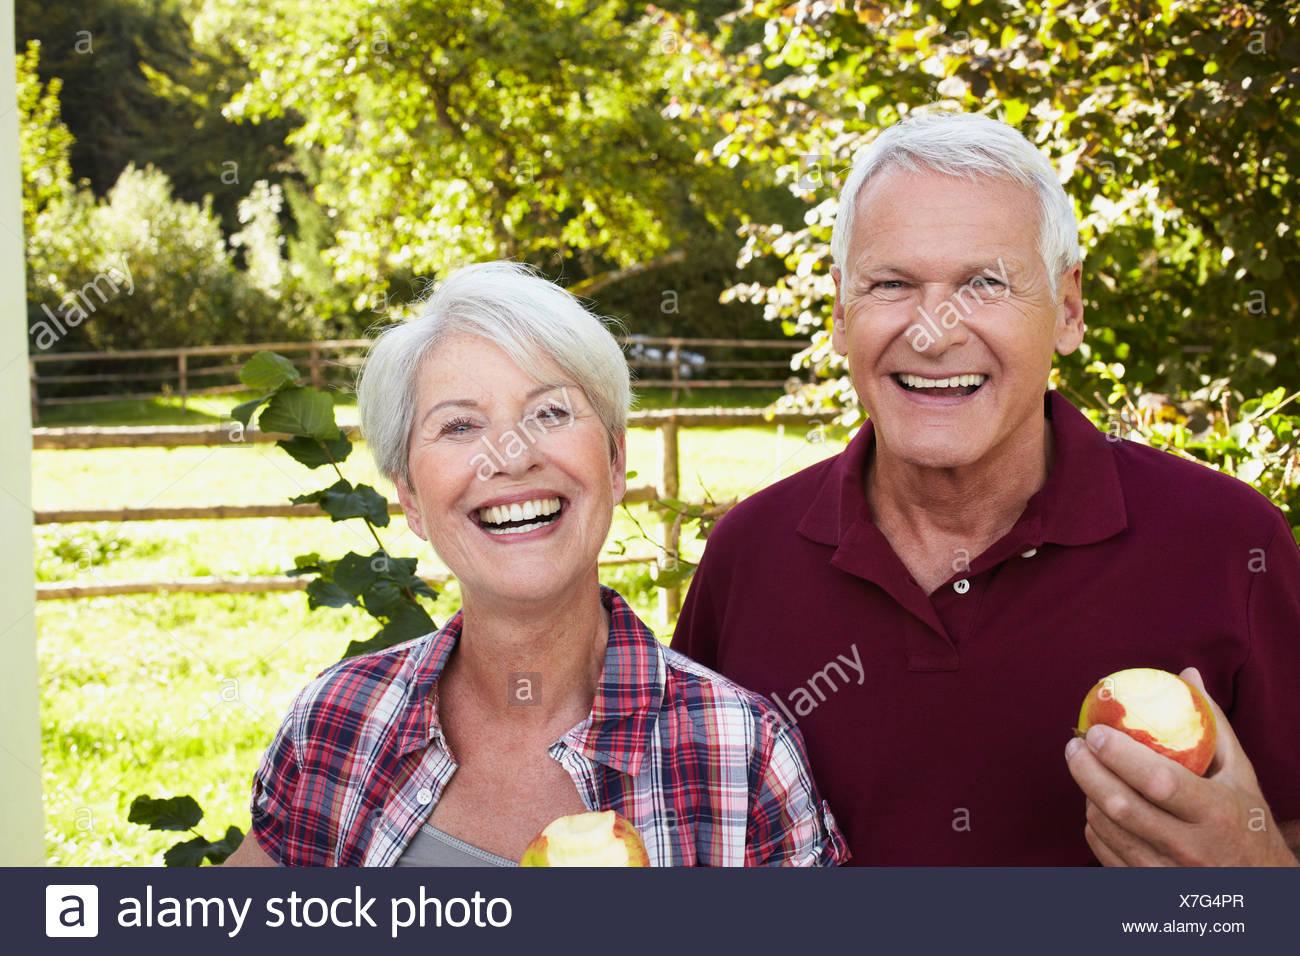 Senior couple eating apples smiling - Stock Image